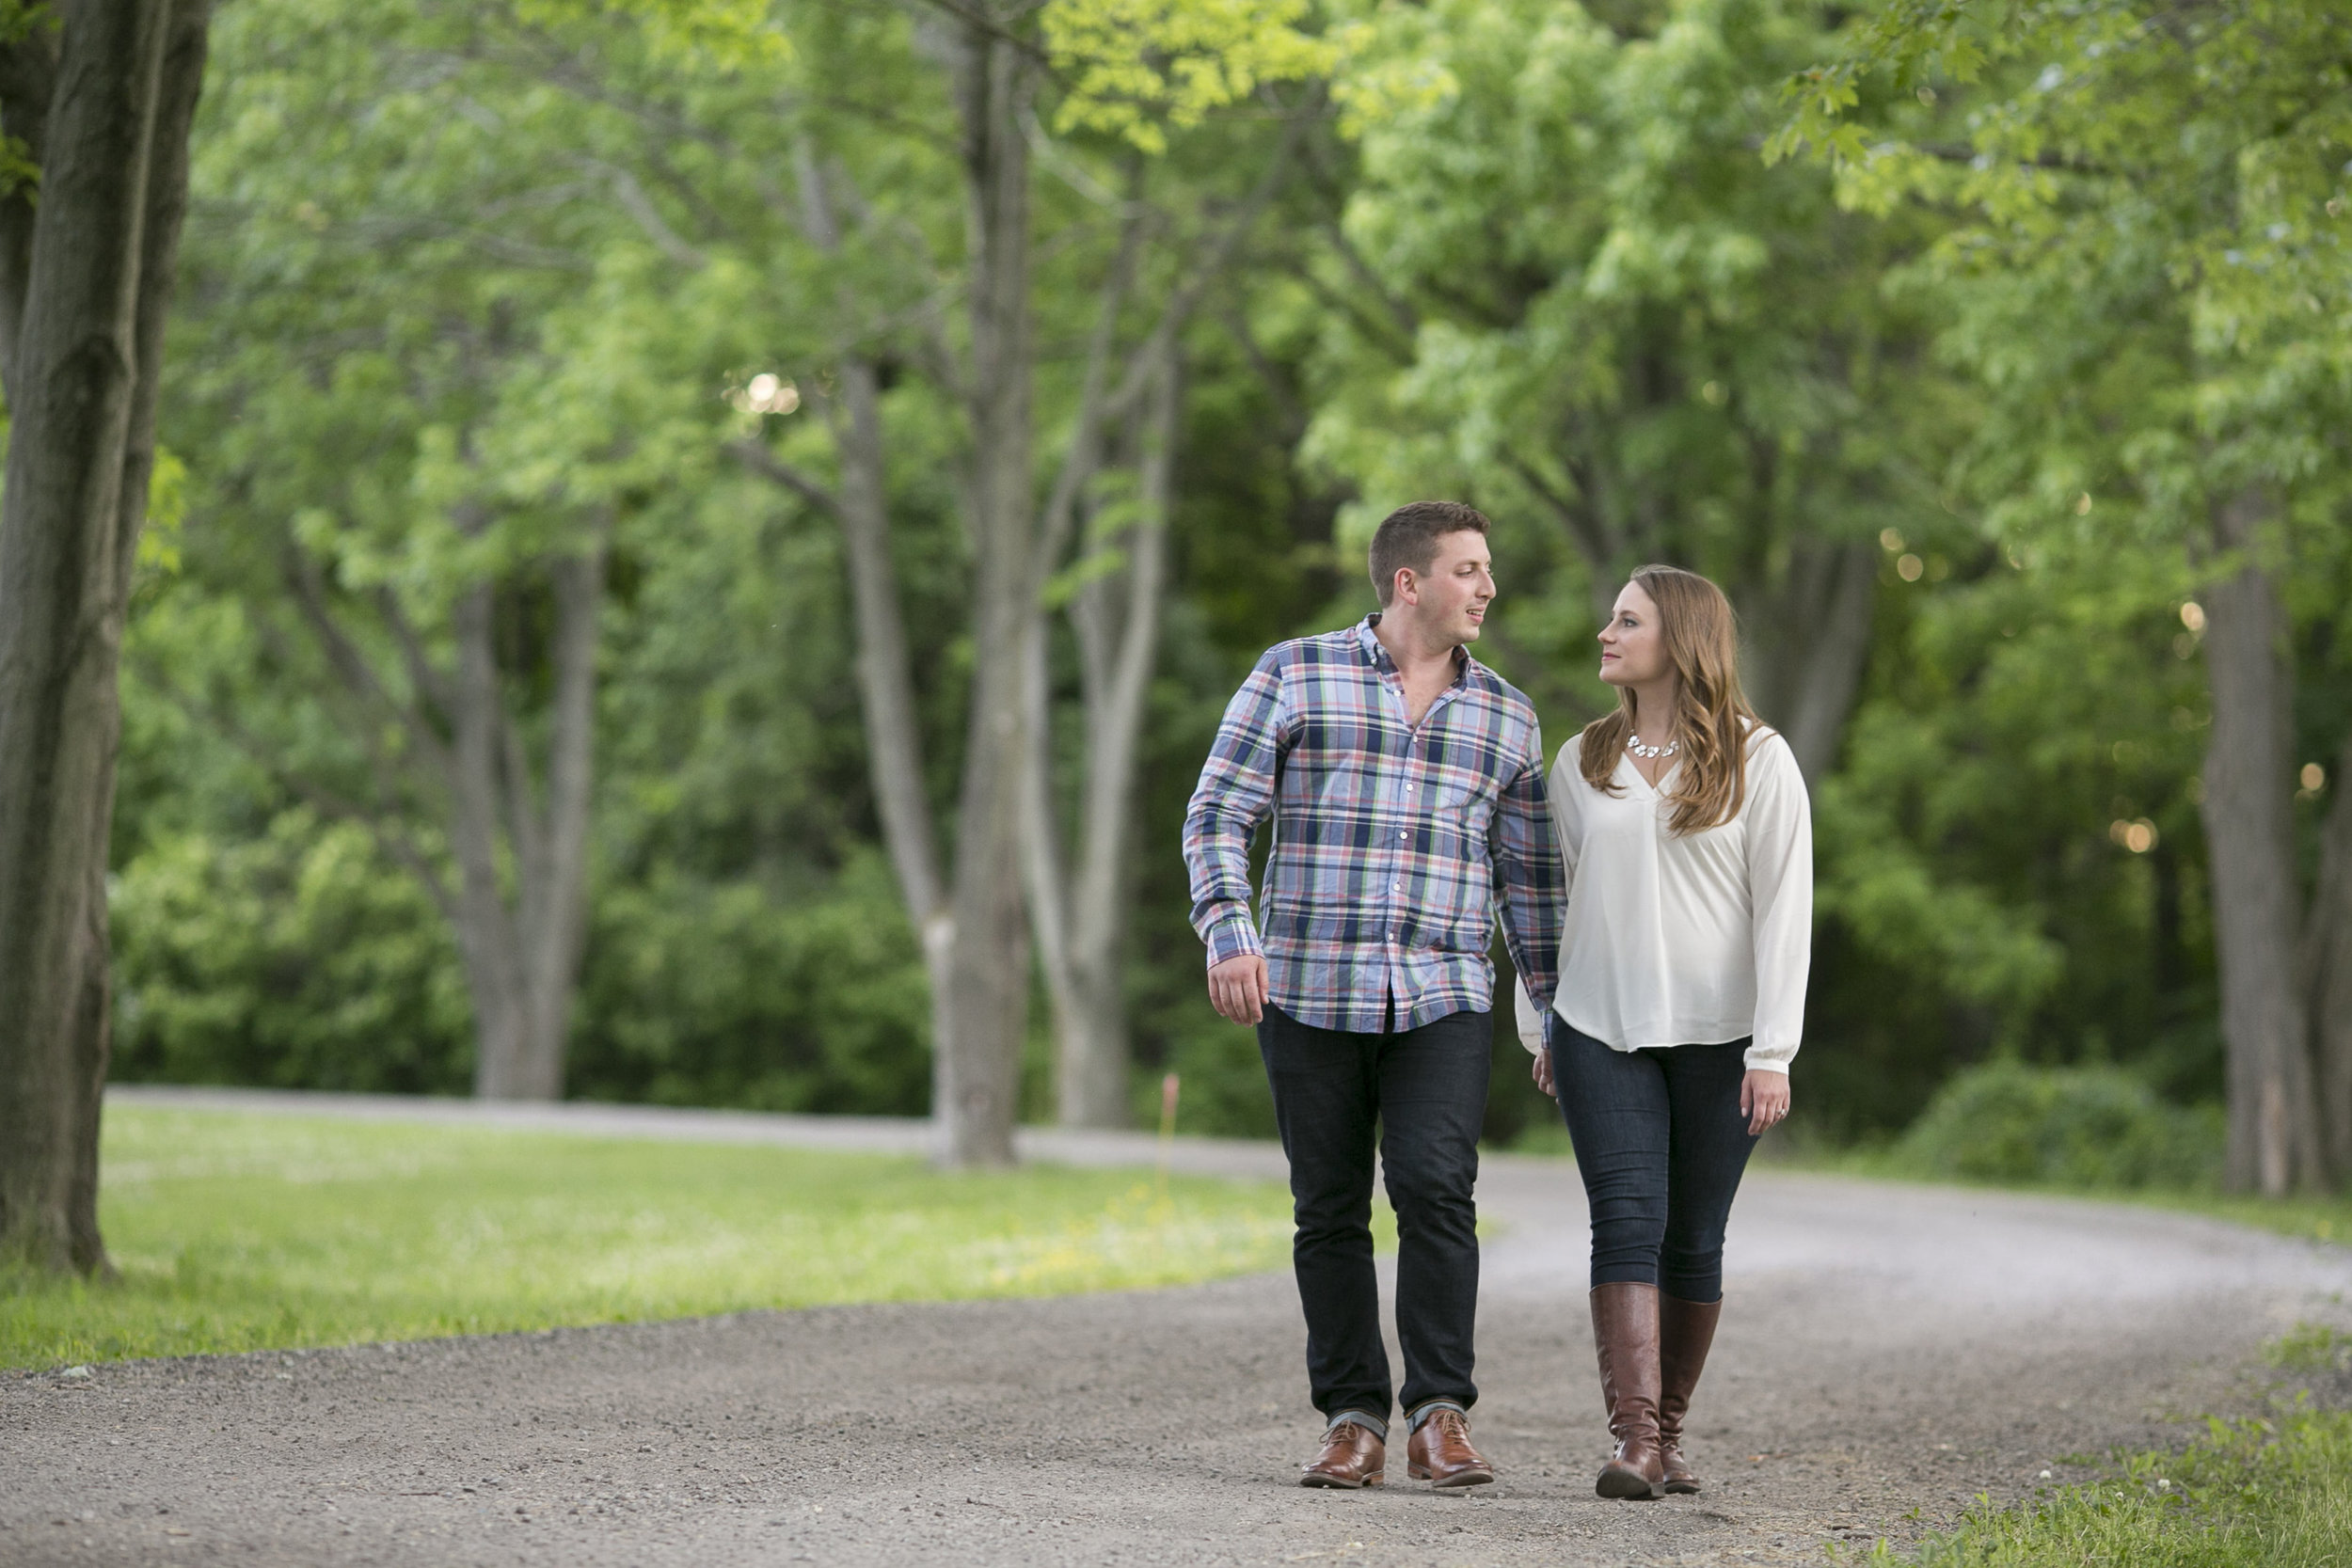 Niagara-on-the-Lake-Summer-Engagement-photos-by-Philosophy-Studios017.JPG